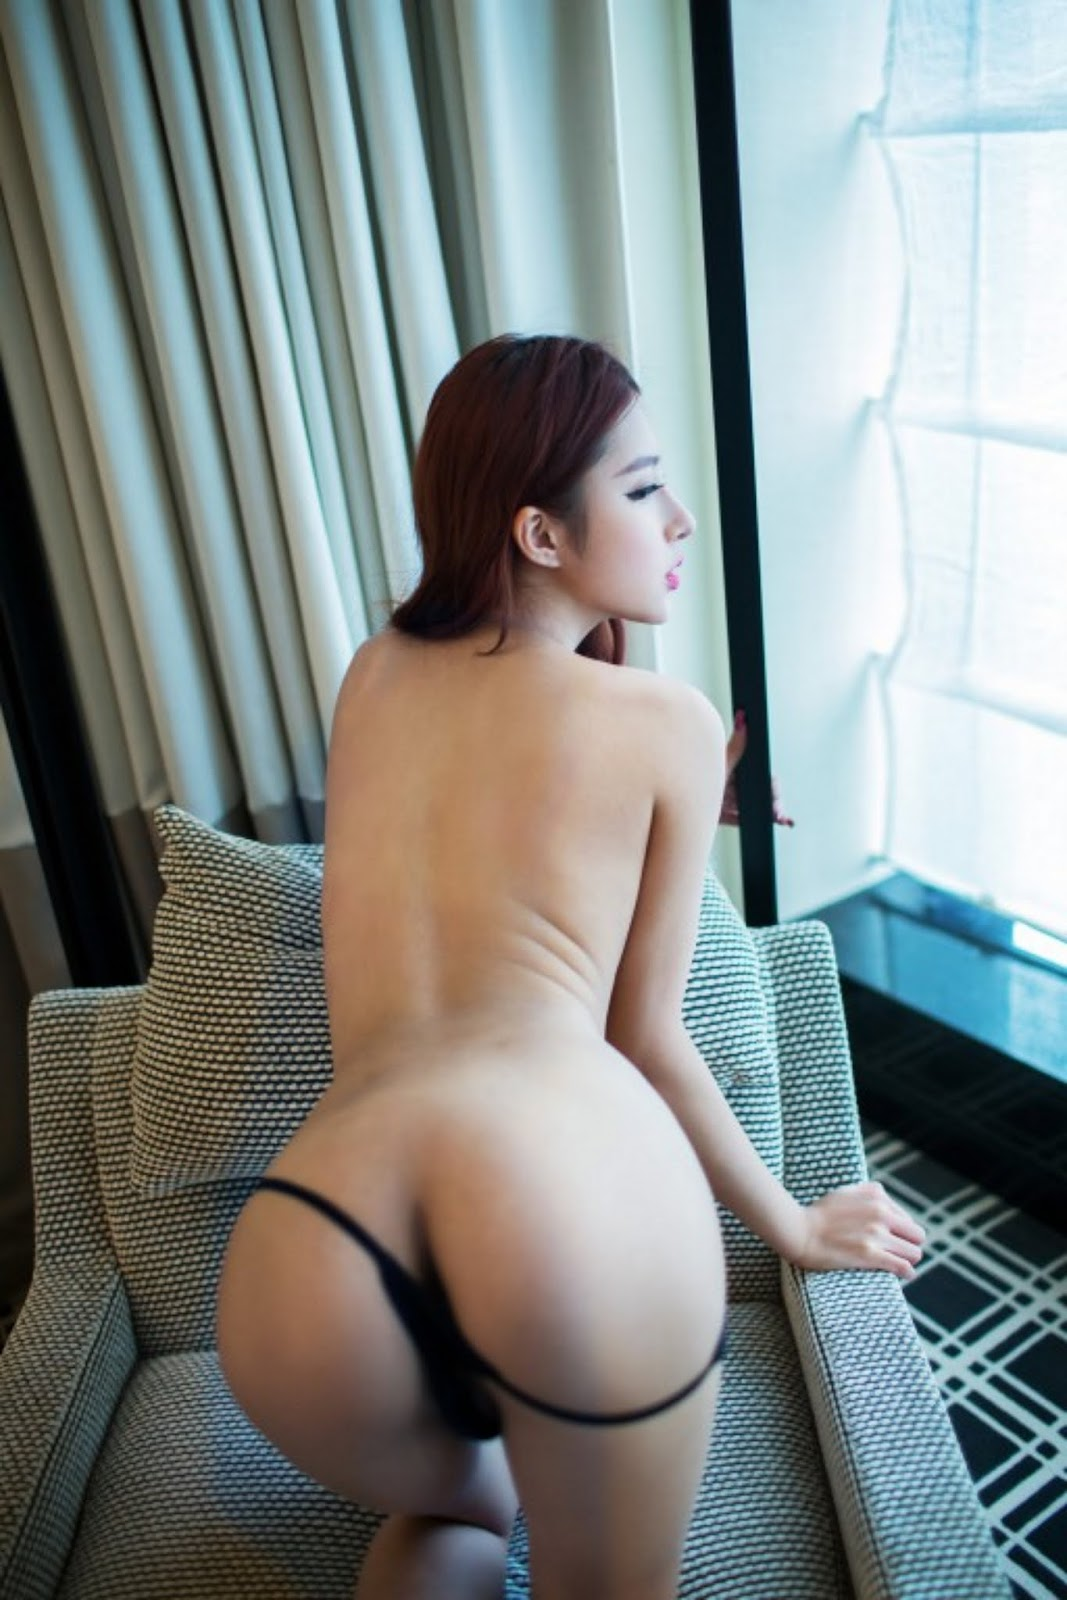 %25C2%25B1 %25C2%25B1 24 - Model Nude TUIGIRL NO.49 Beauty Body Tits